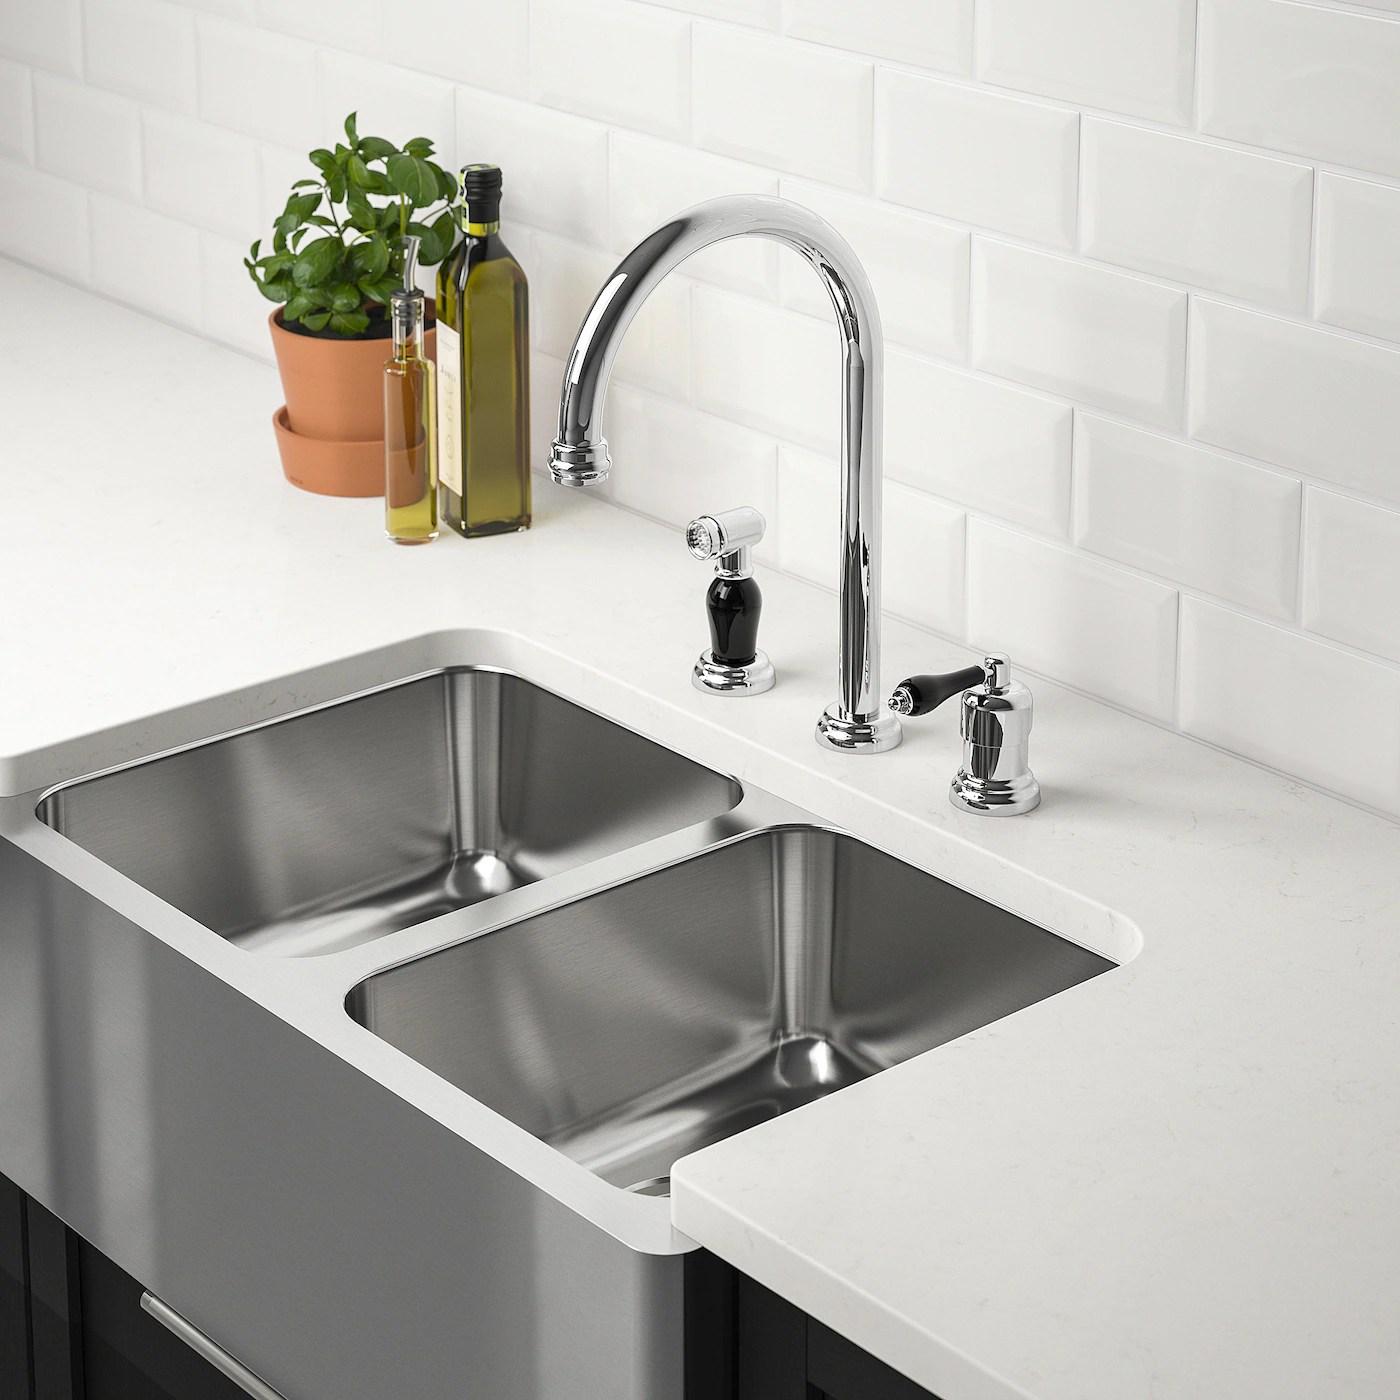 bredsjon apron front double bowl sink under glued stainless steel 30x18 75 9x45 cm